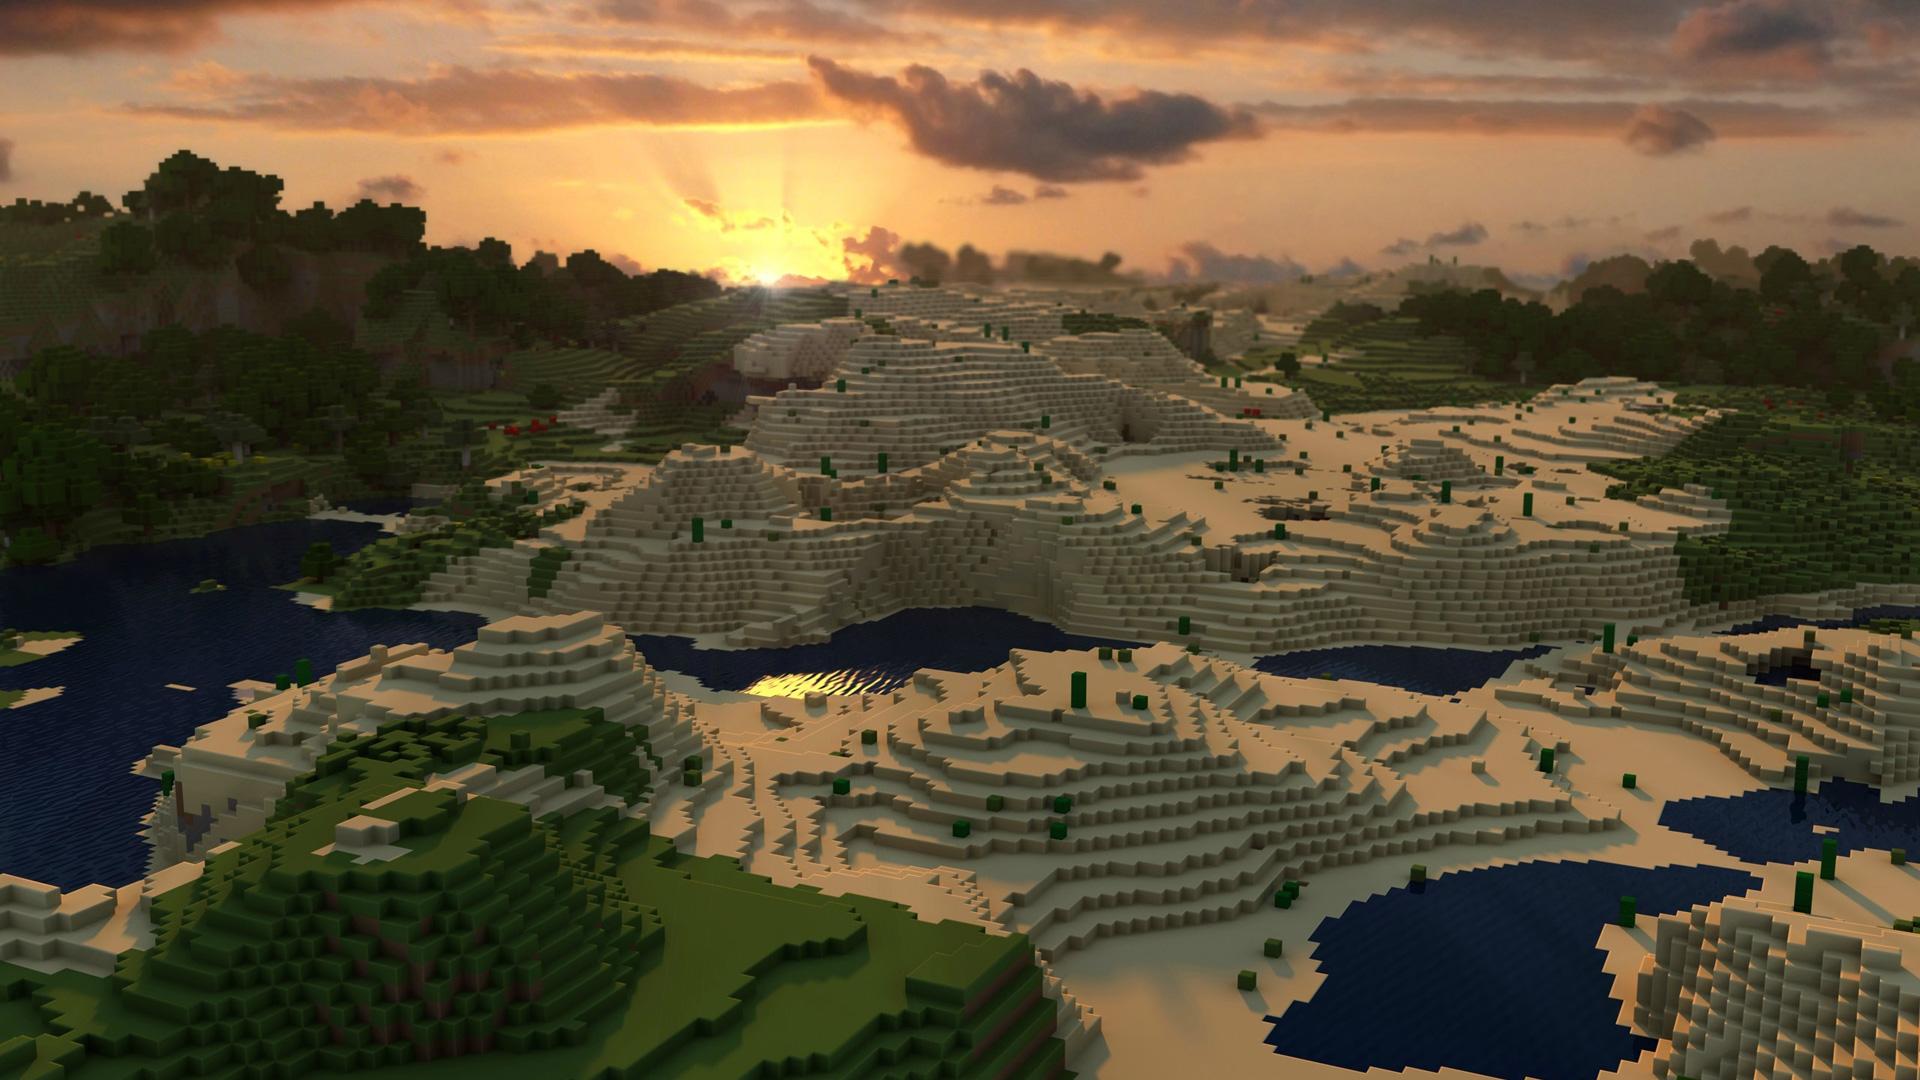 Free Minecraft Wallpaper in 1920x1080